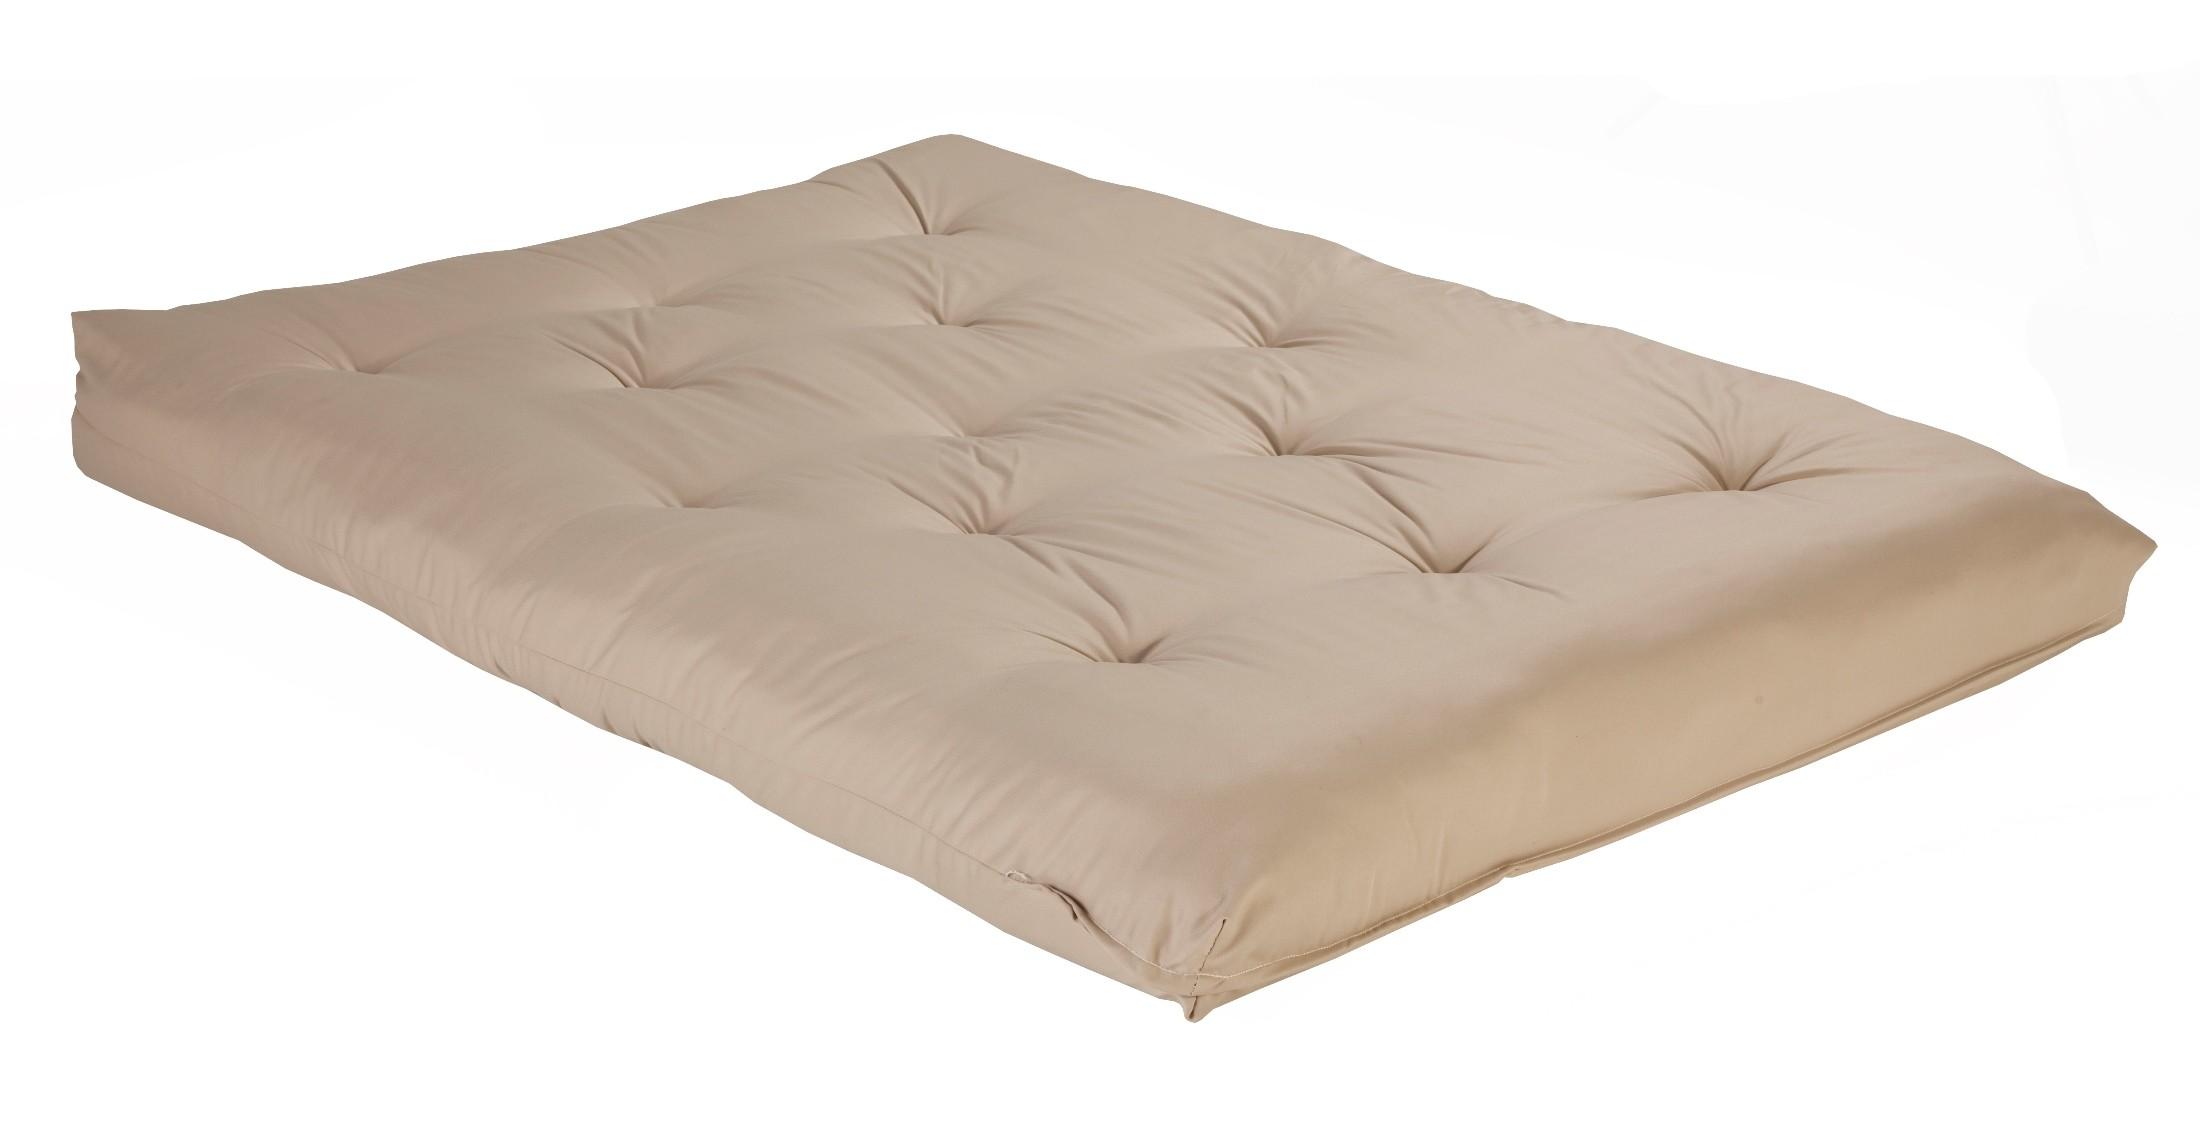 Khaki Full Size Futon Mattress From Fashion Bed Group